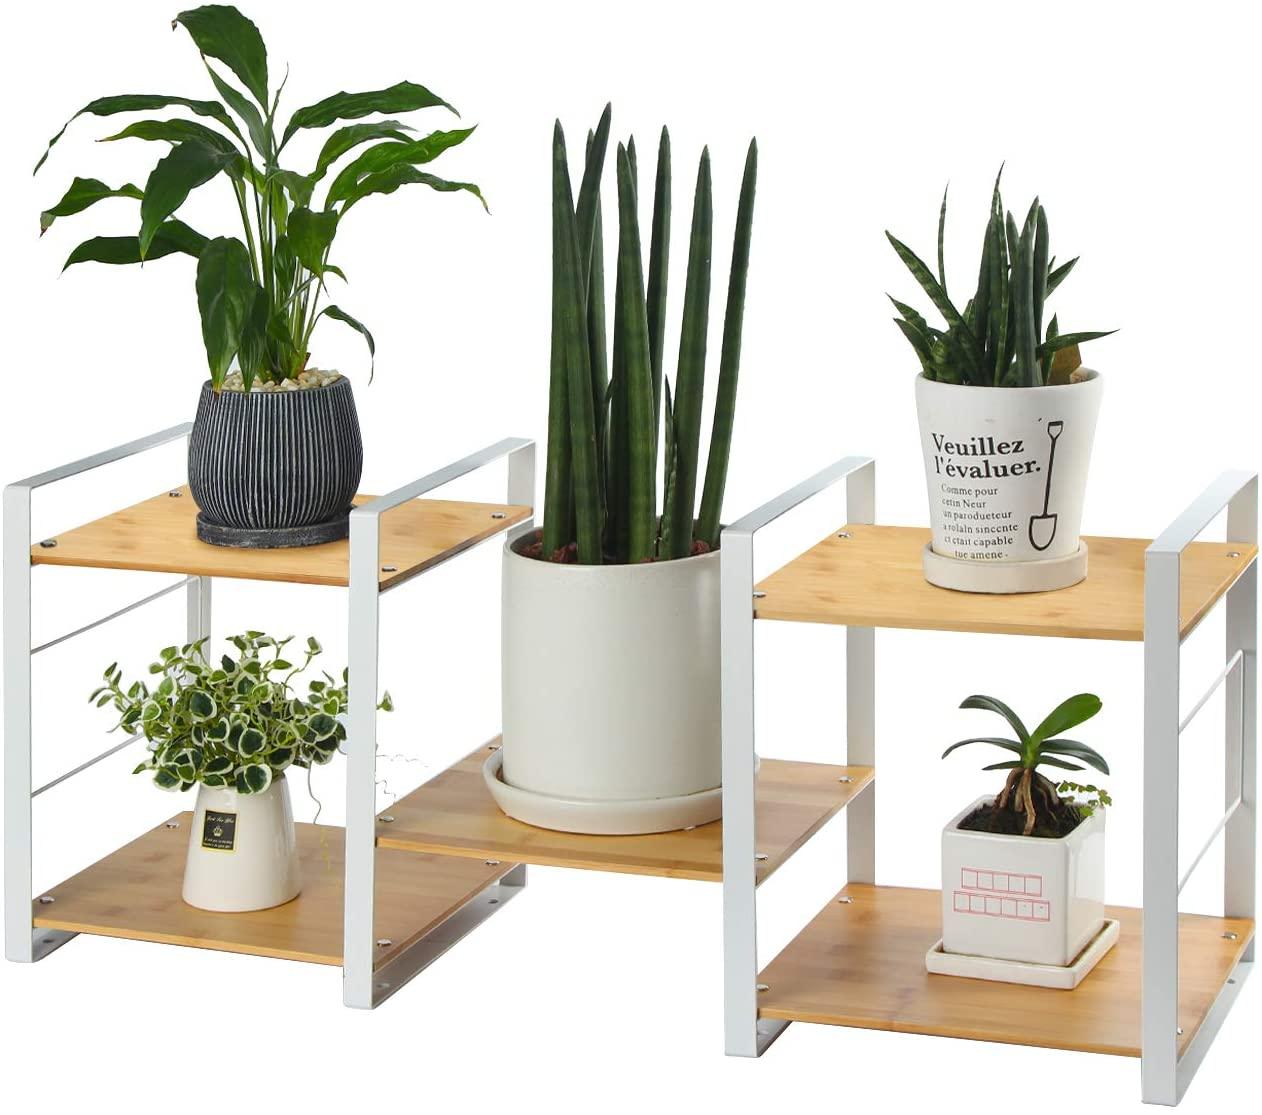 J JACKCUBE DESIGN - Multi Tier Bamboo Plant Stand Planter Rack Adjustable Flower Succulent Shelving Unit Stylish Indoor & Outdoor Garden Patio Pots Holder Display (White)- MK506B